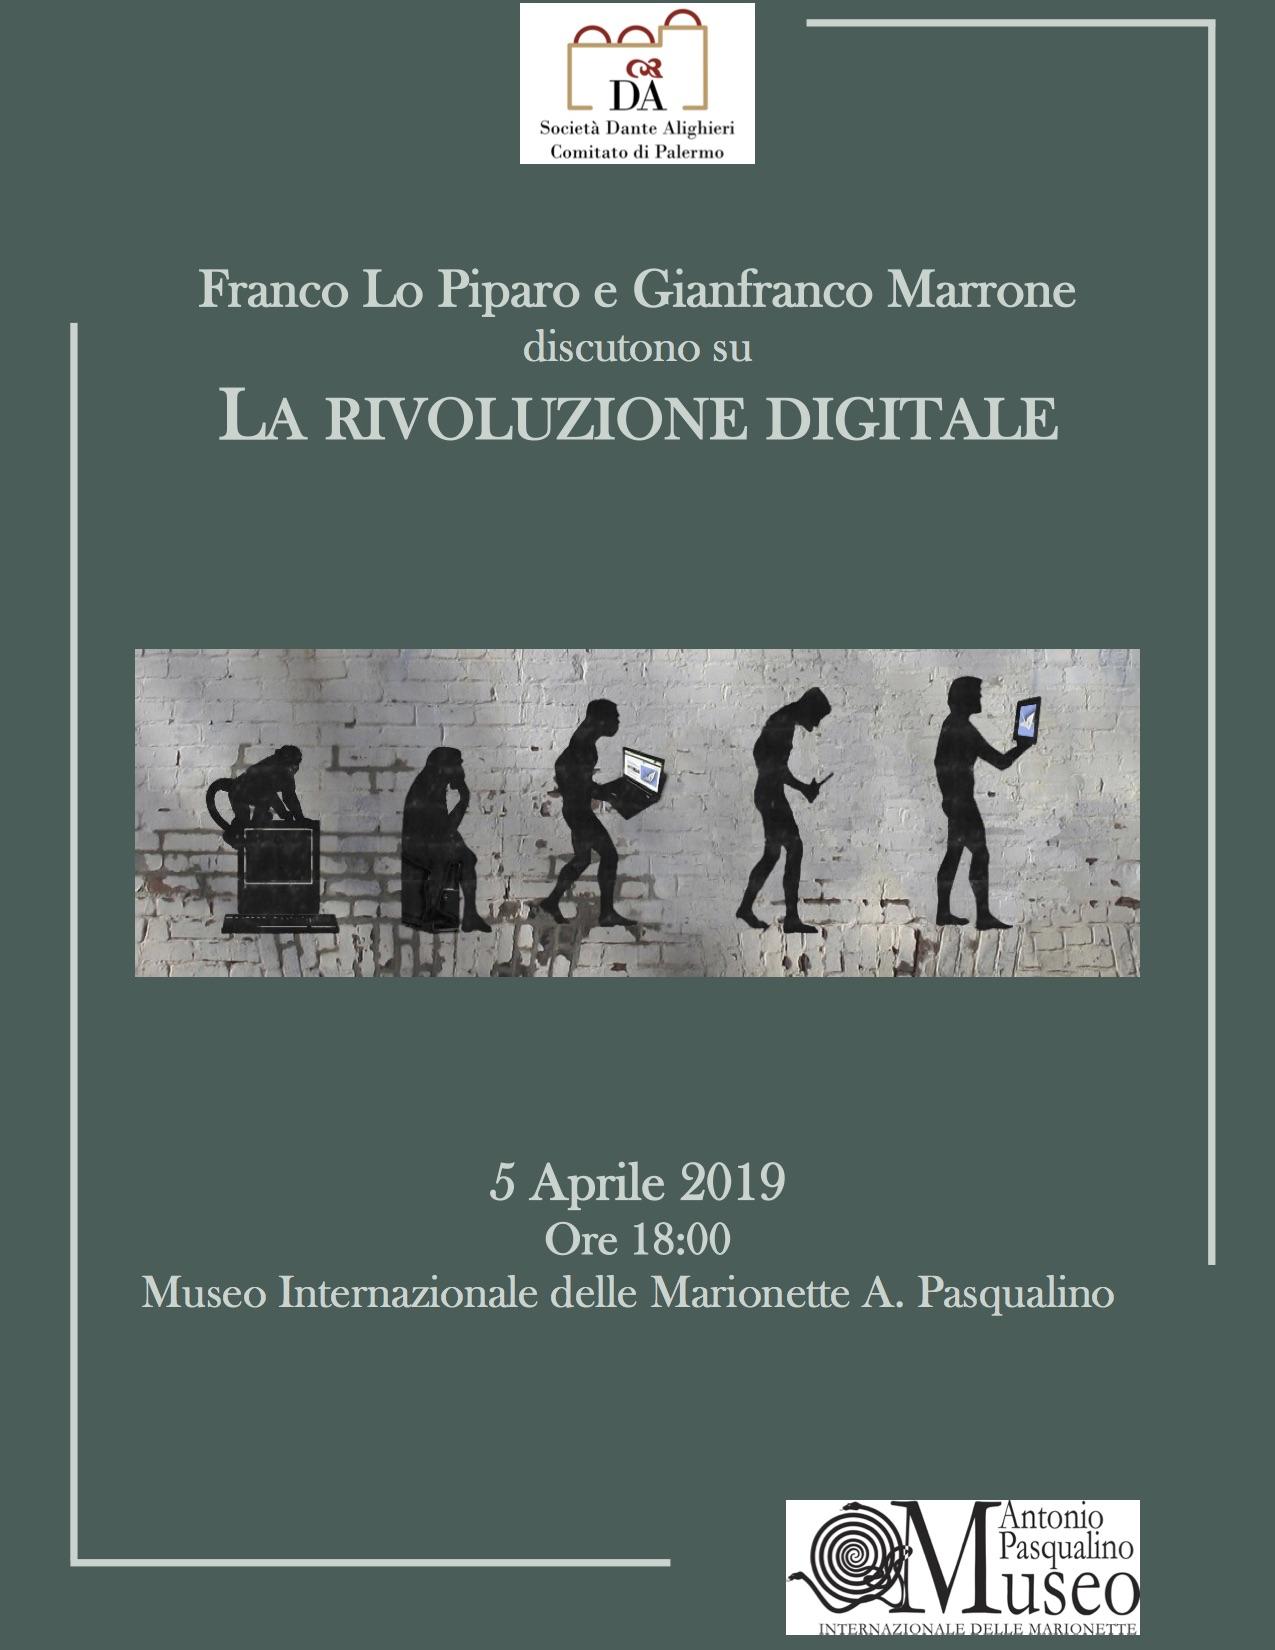 2019_conferenza-rivoluzione-digitale.jpg - 247.68 kB